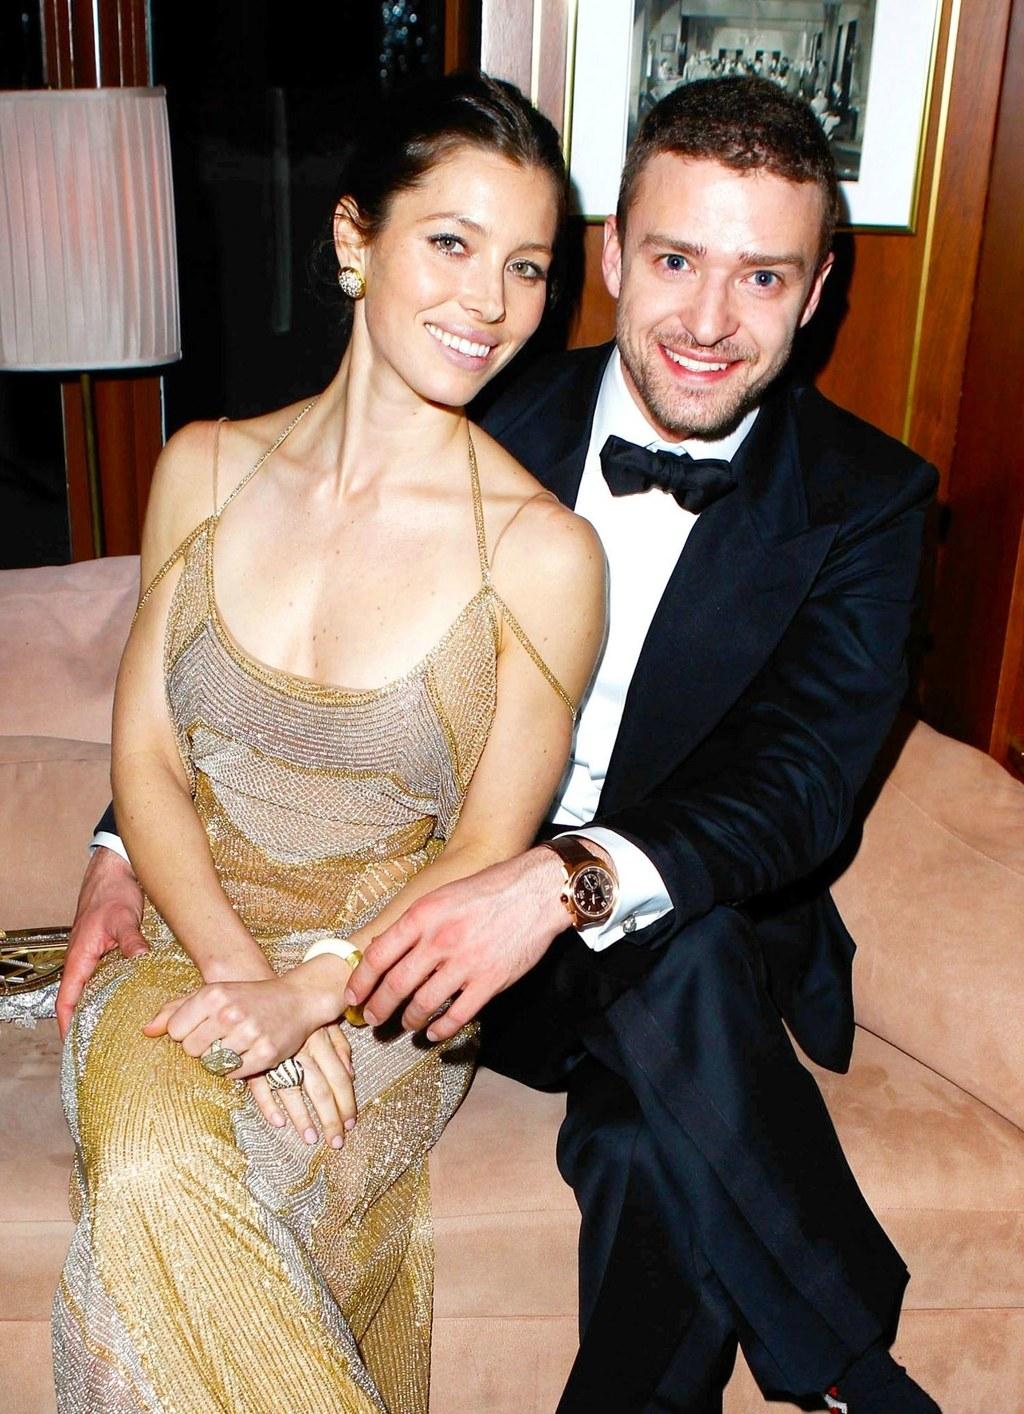 Джастин Тимберлейк и его жена актриса Джессика Бил